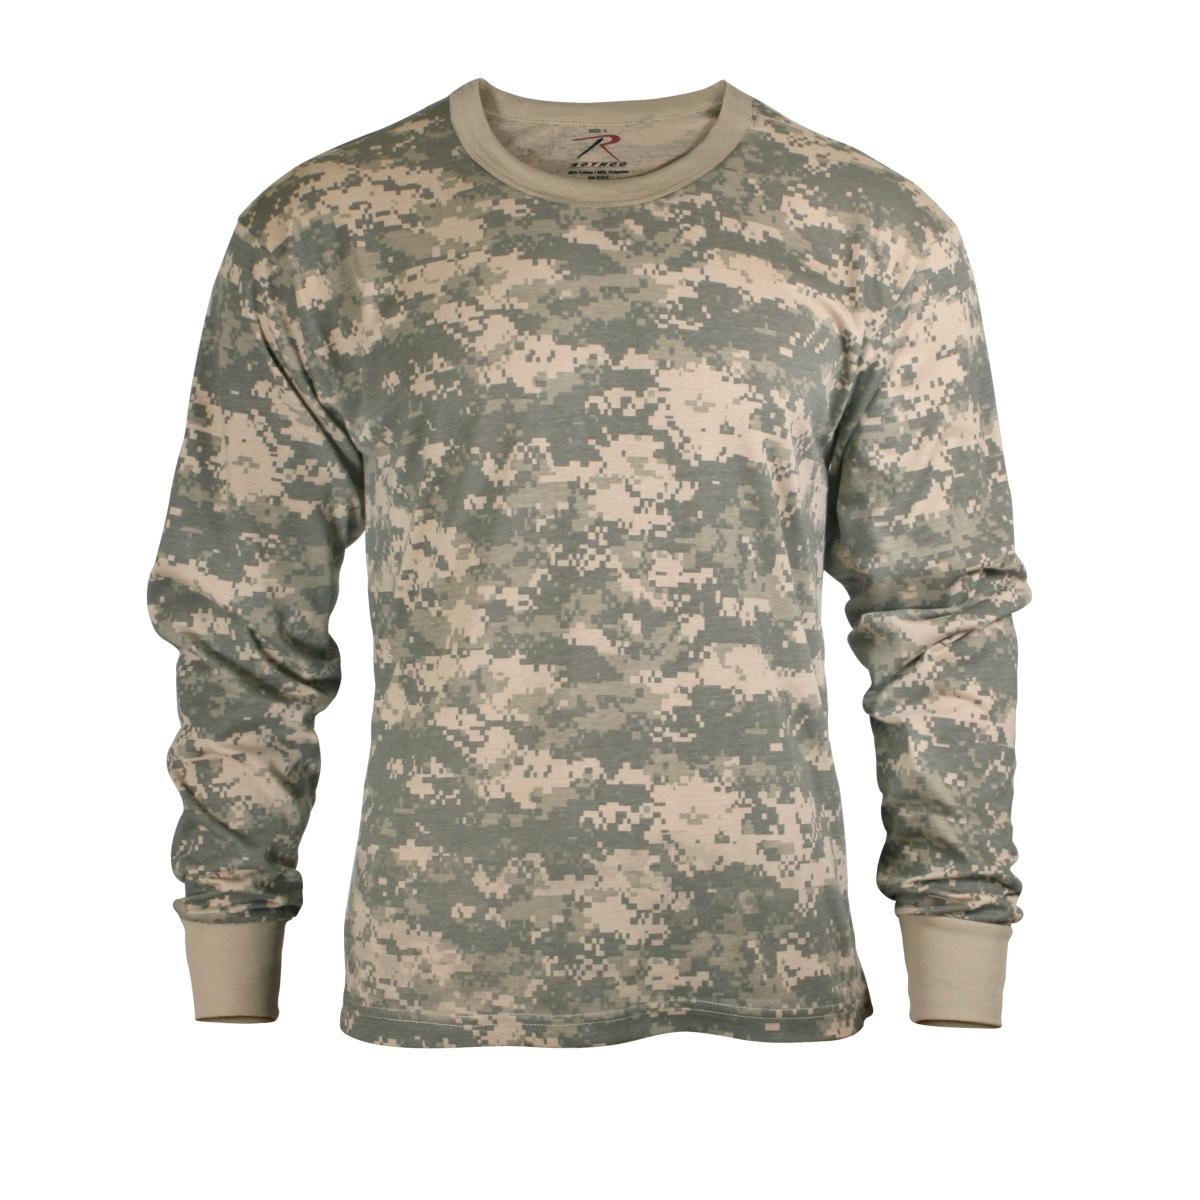 e87a5c89 Details about Mens Long Sleeve ACU Digital Camo T-Shirt